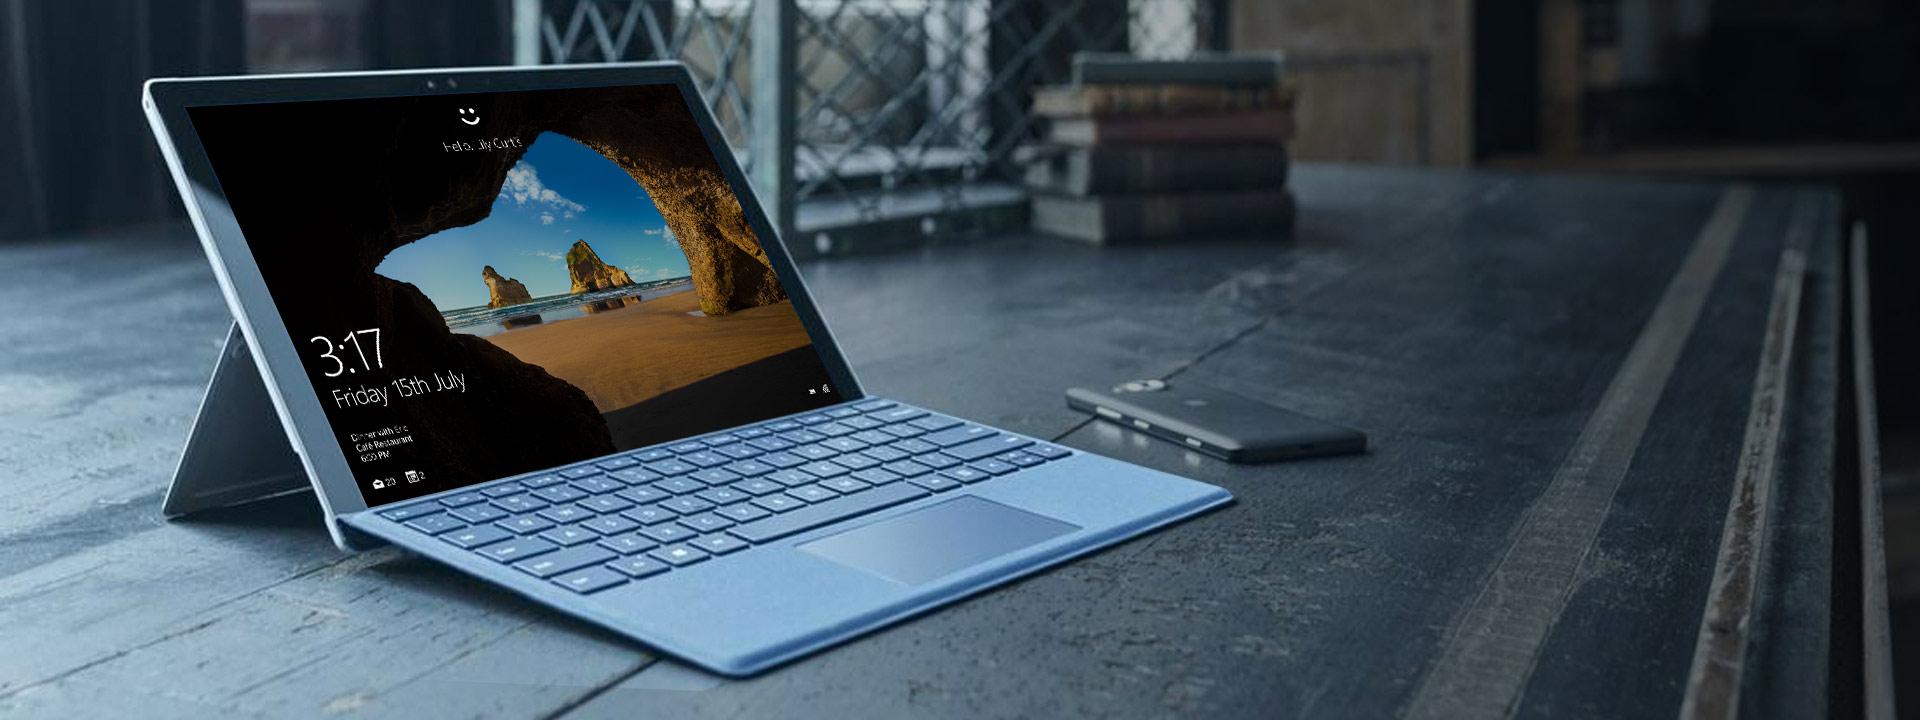 Lenovo Yoga 900 with Windows 10 Start screen